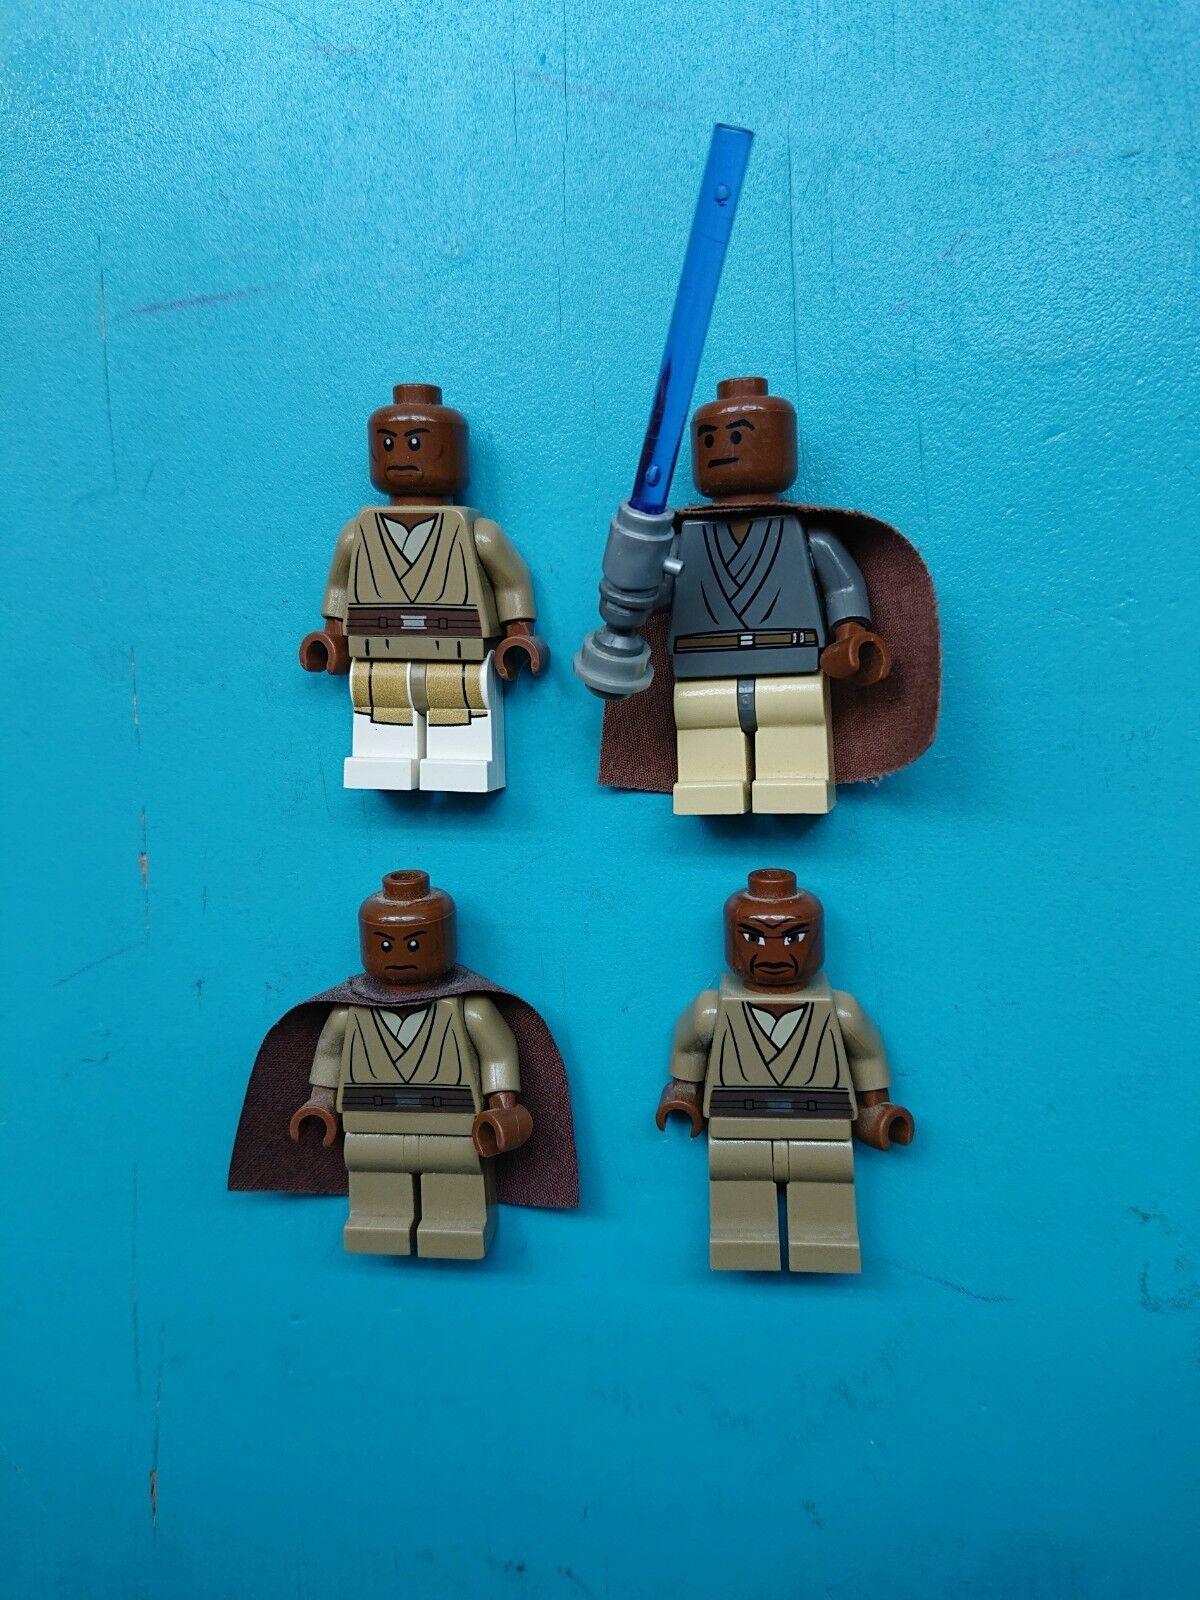 Lego Star Wars Lot Lot Lot 4 Different Jedi Mace Windu Minifigures, Lightup Lightsaber  002b5c